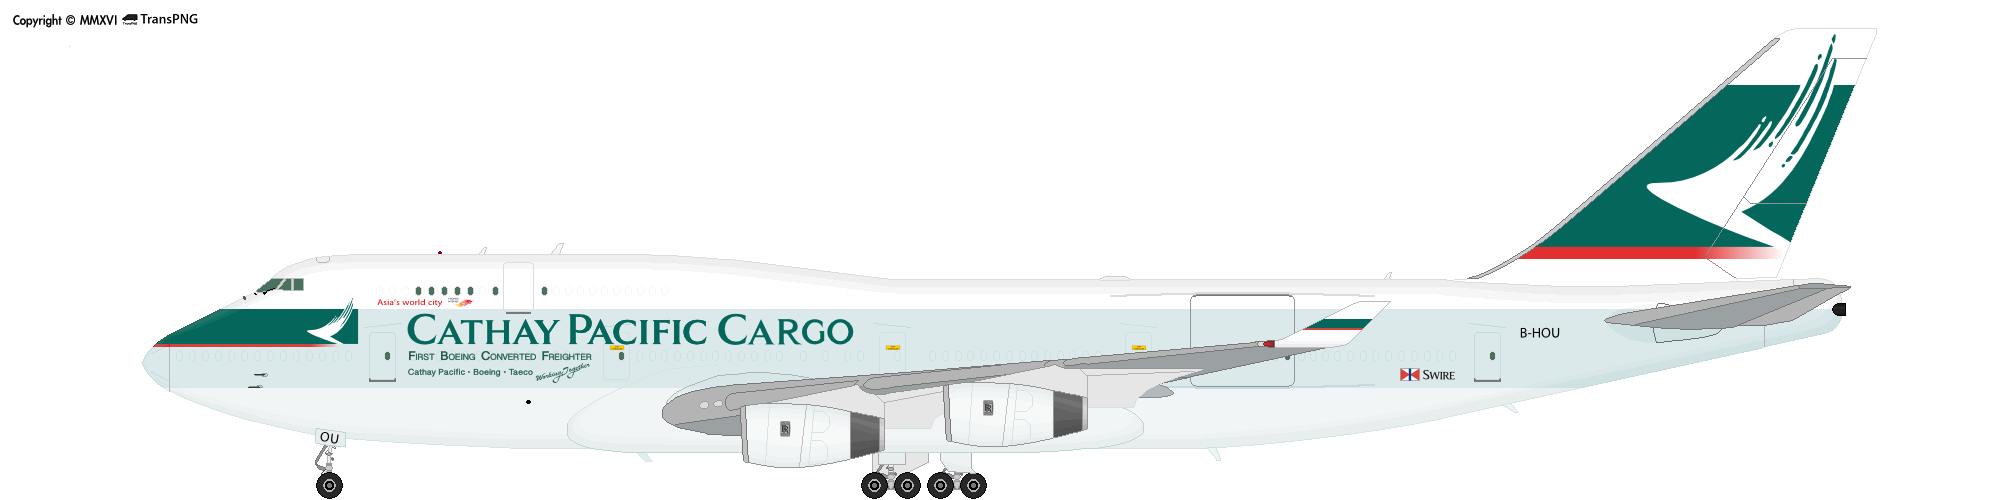 Airplane 6207